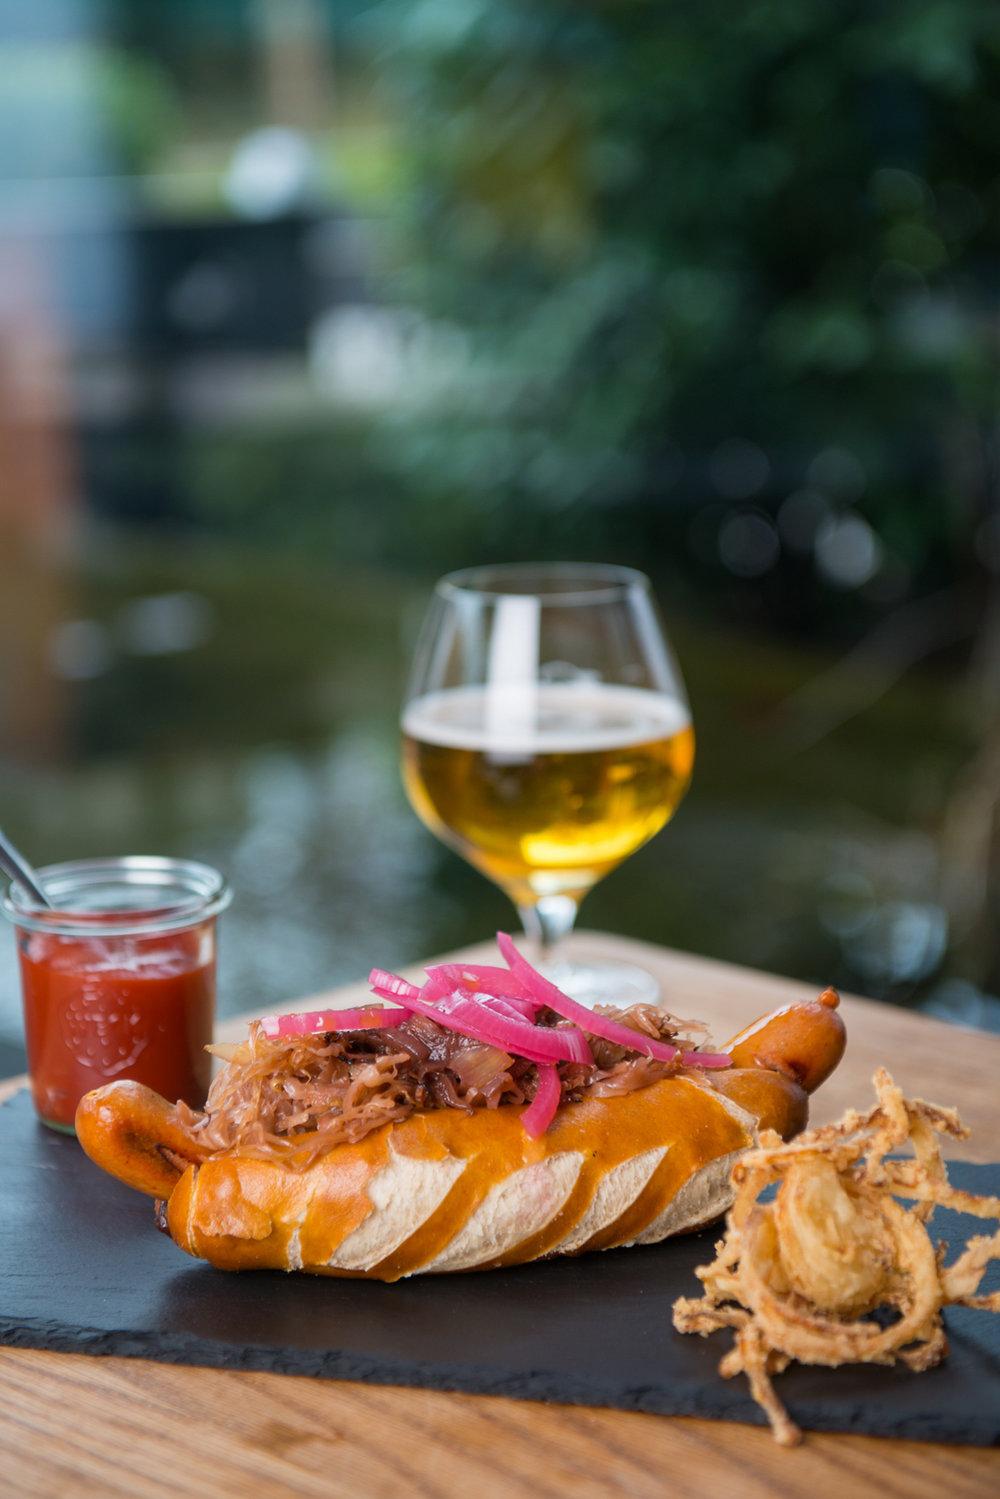 Food styling and food photography hotdog